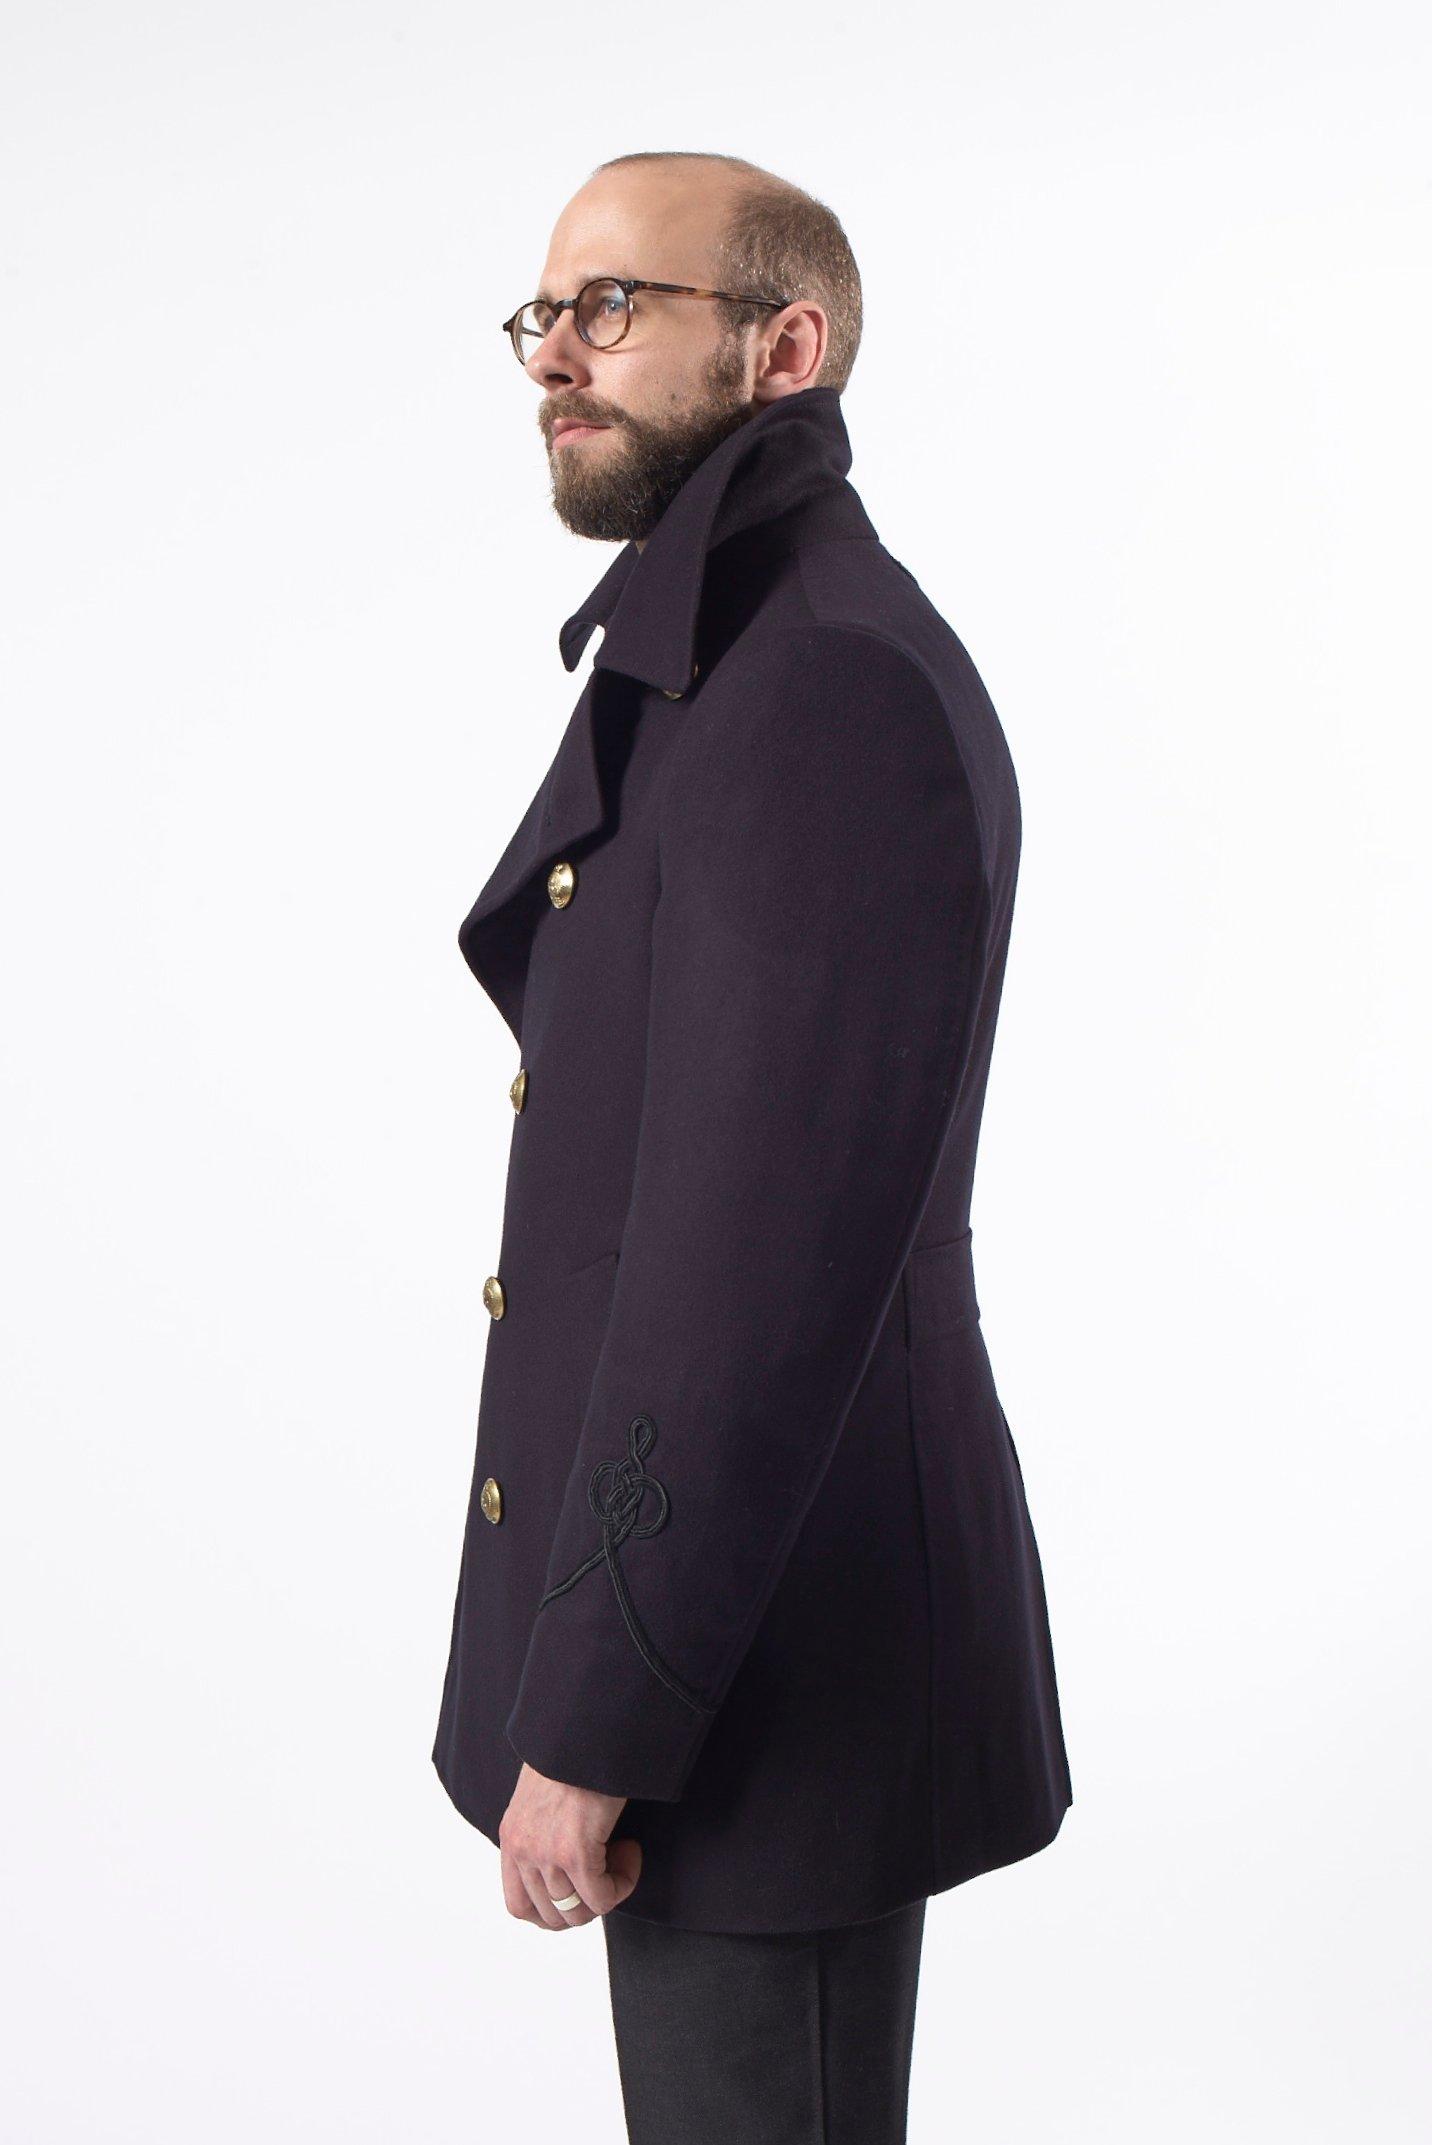 The bespoke pea coat – Part 5 – Permanent Style